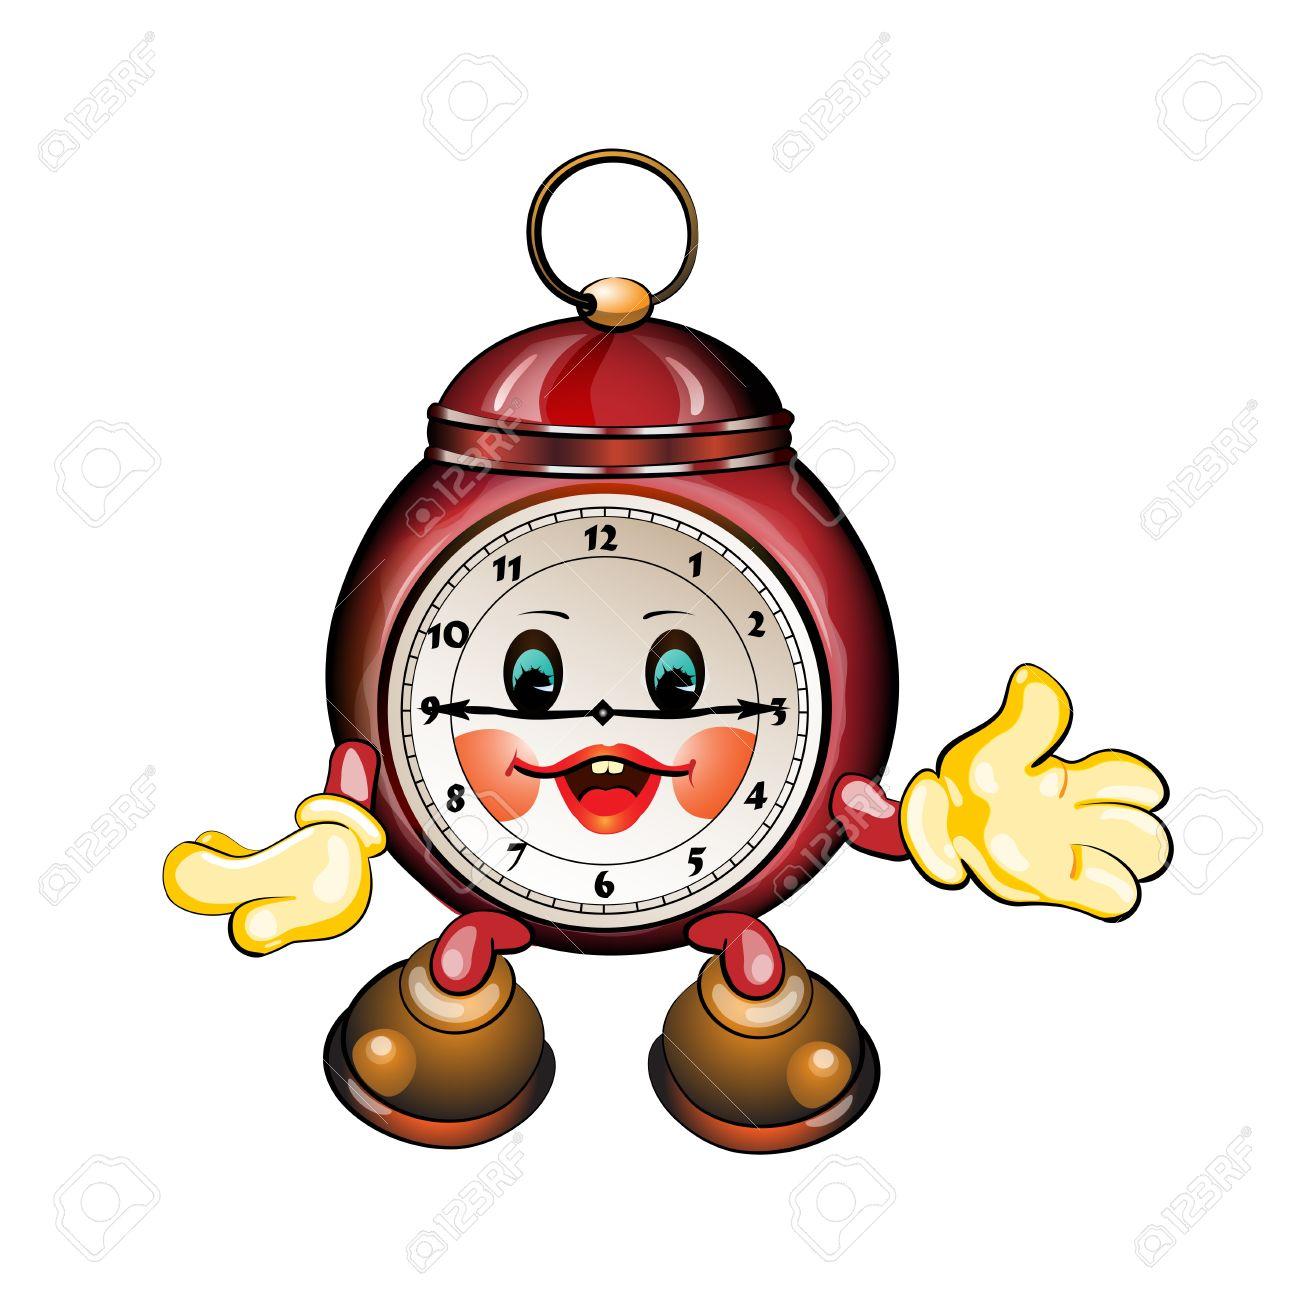 Cute Cartoon Clock Royalty Free Cliparts, Vectors, And Stock.